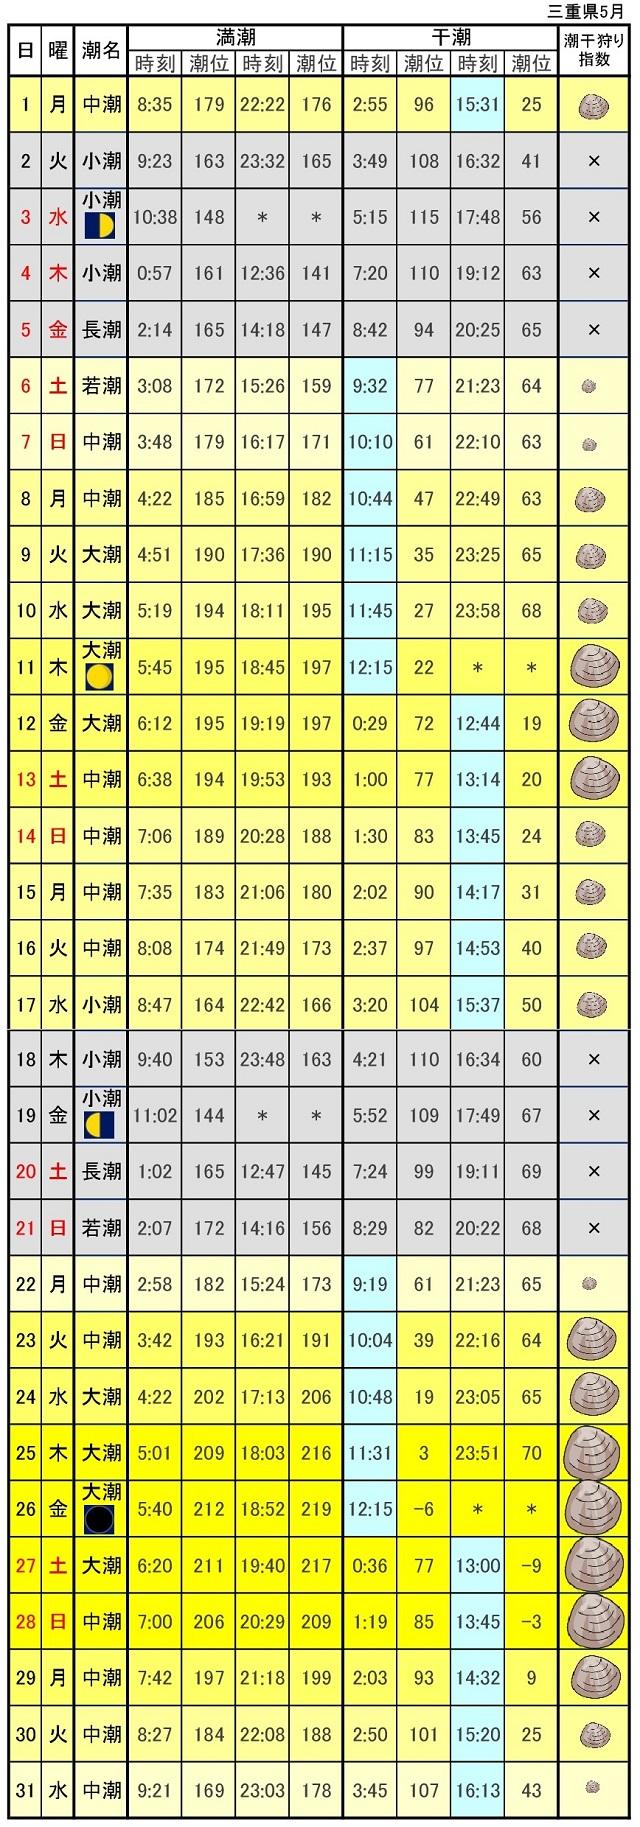 三重県潮干狩り指標2017年5月